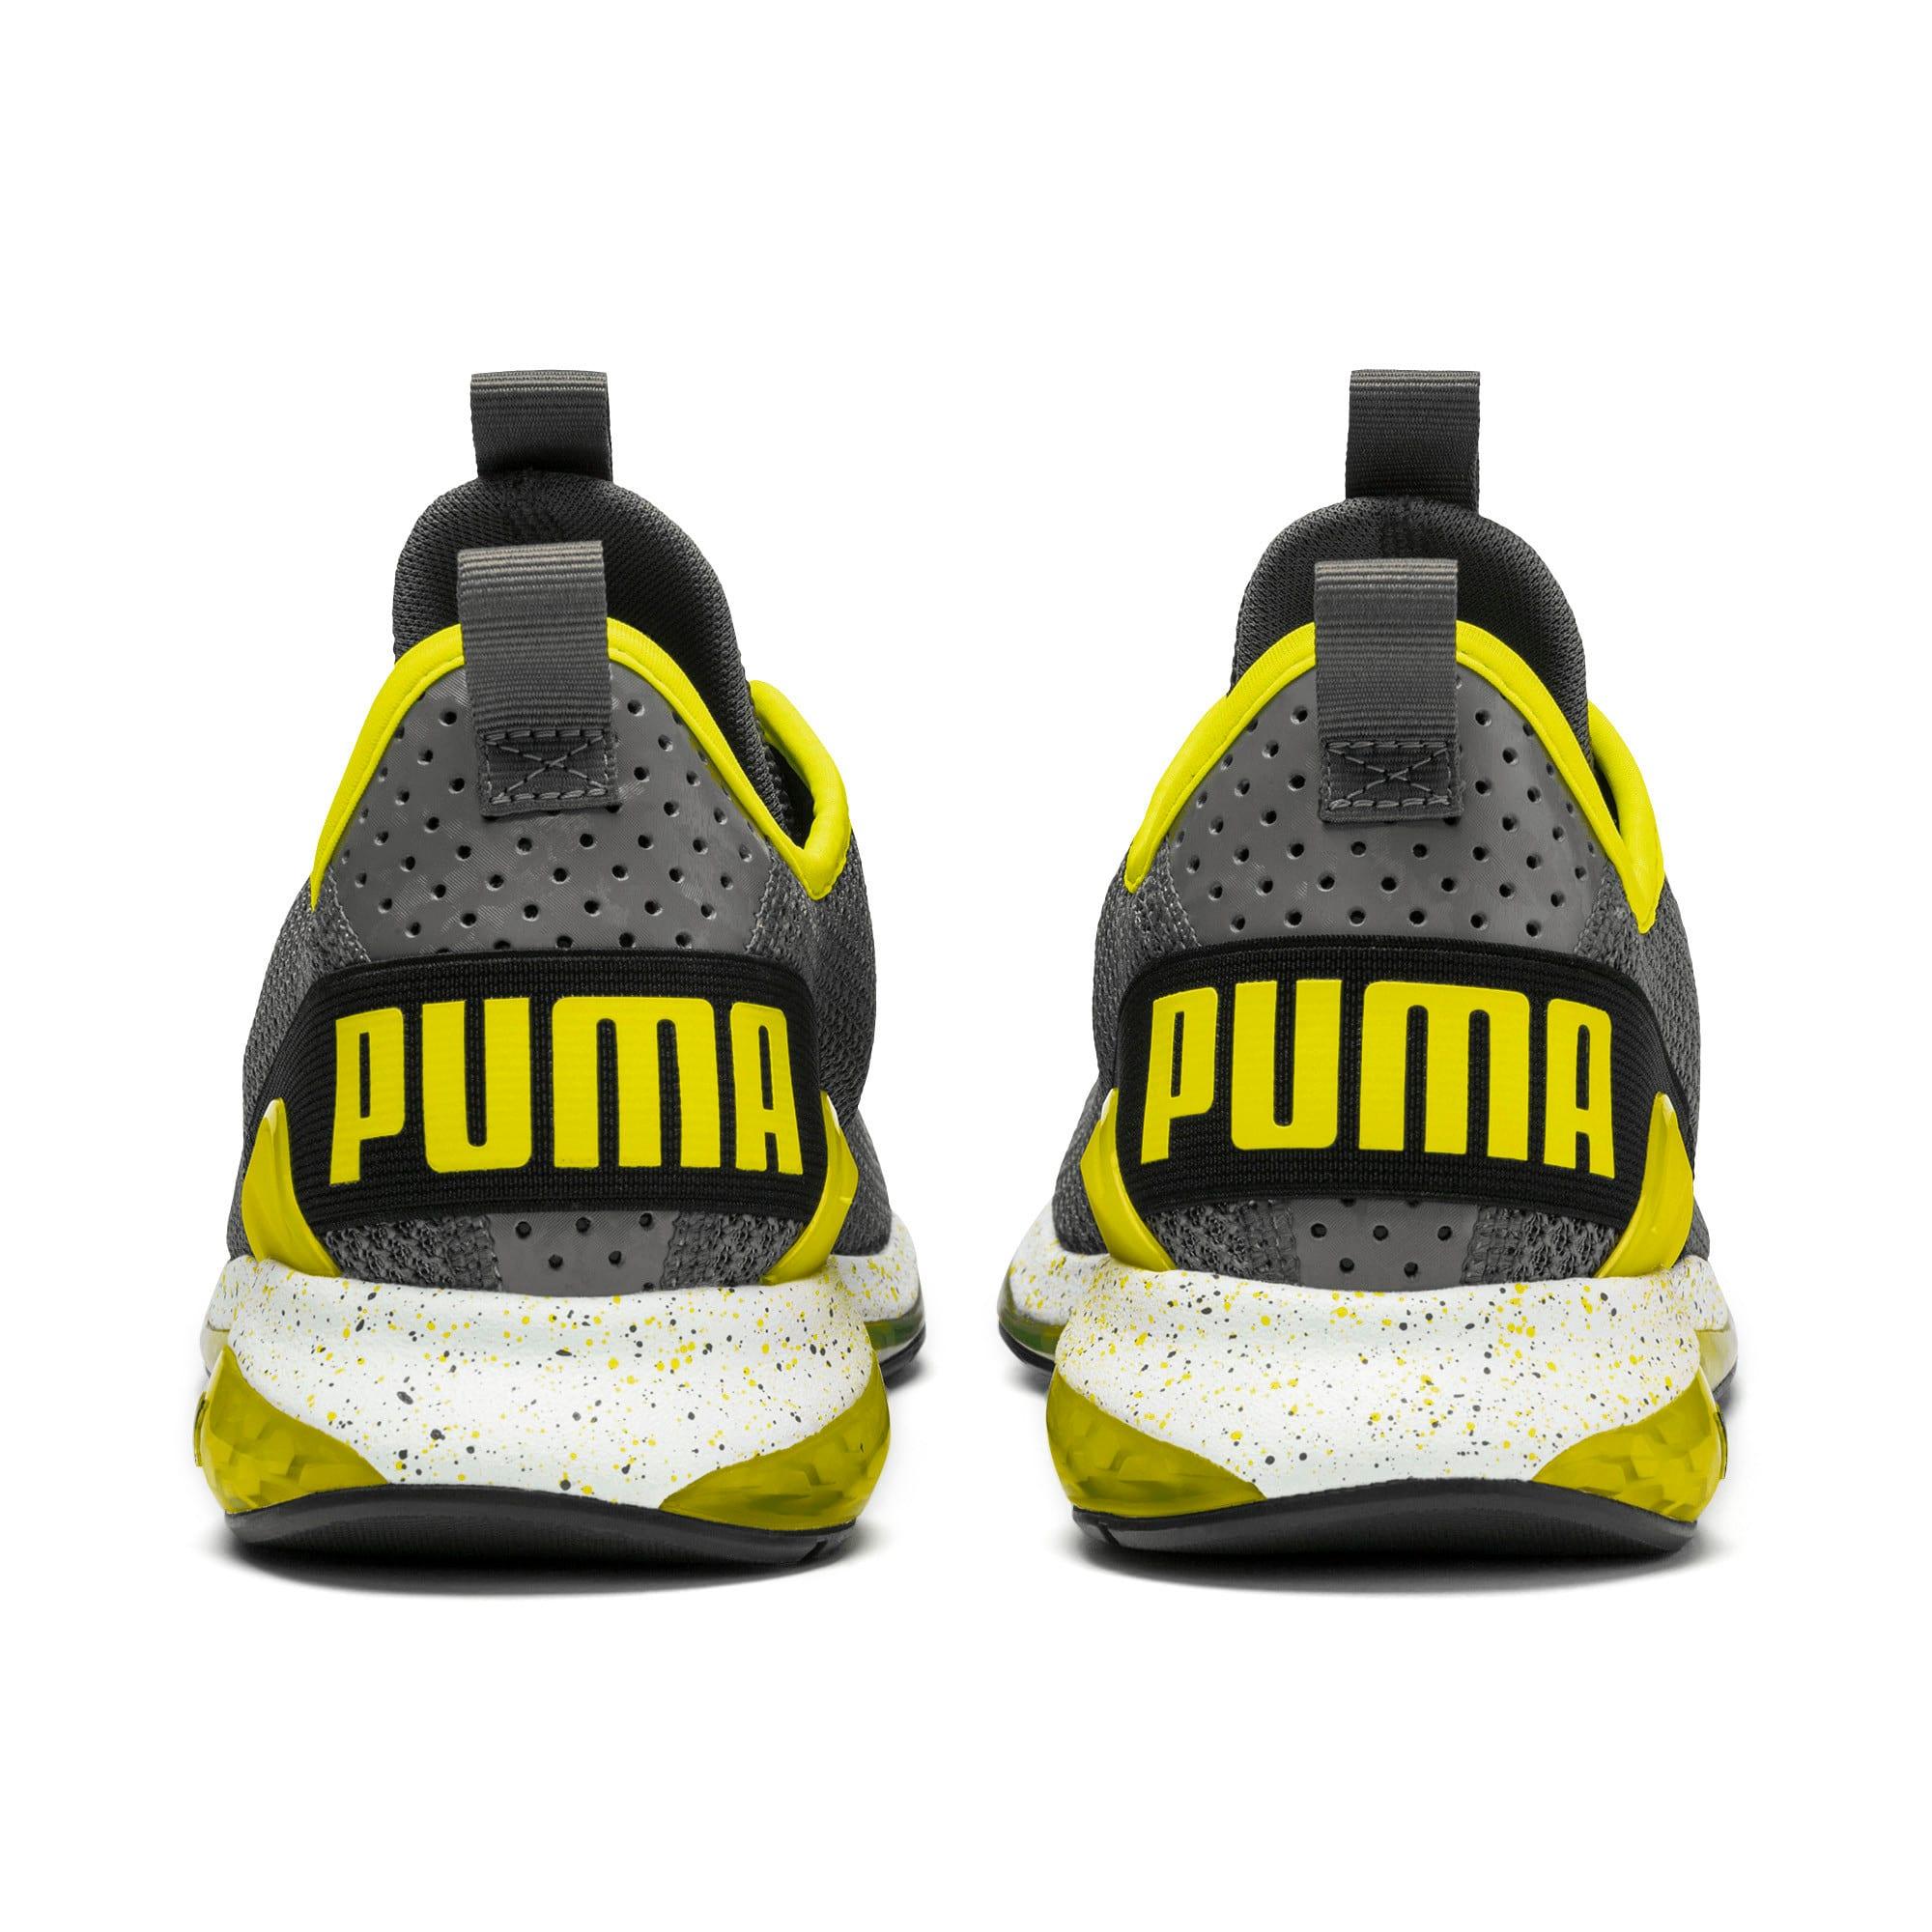 Thumbnail 5 of CELL Descend Weave Men's Training Shoes, CASTLEROCK-Black-Yellow, medium